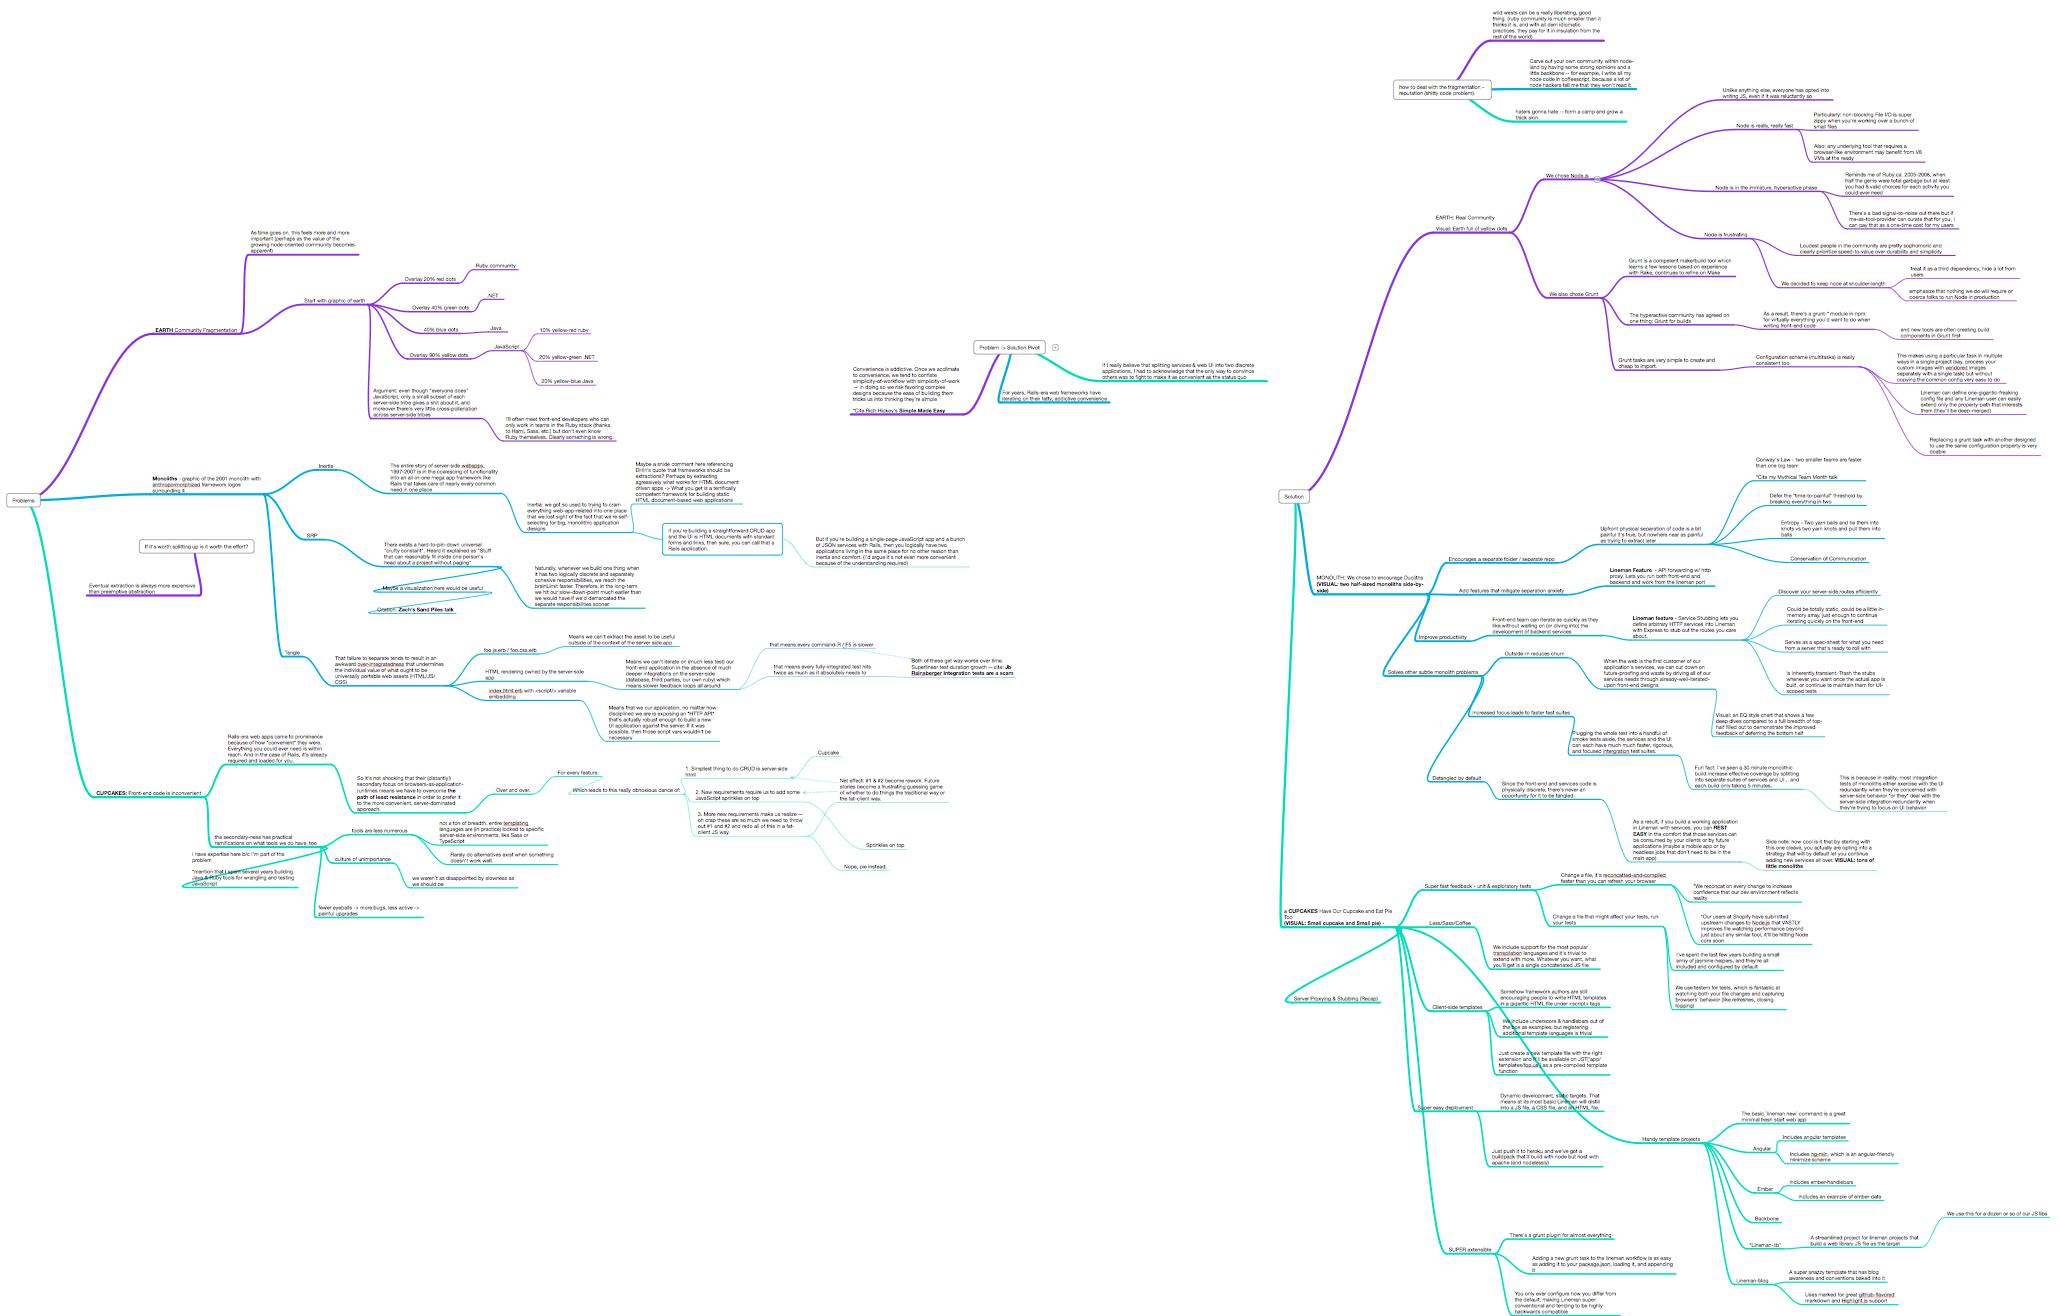 My Lineman talk's mind map